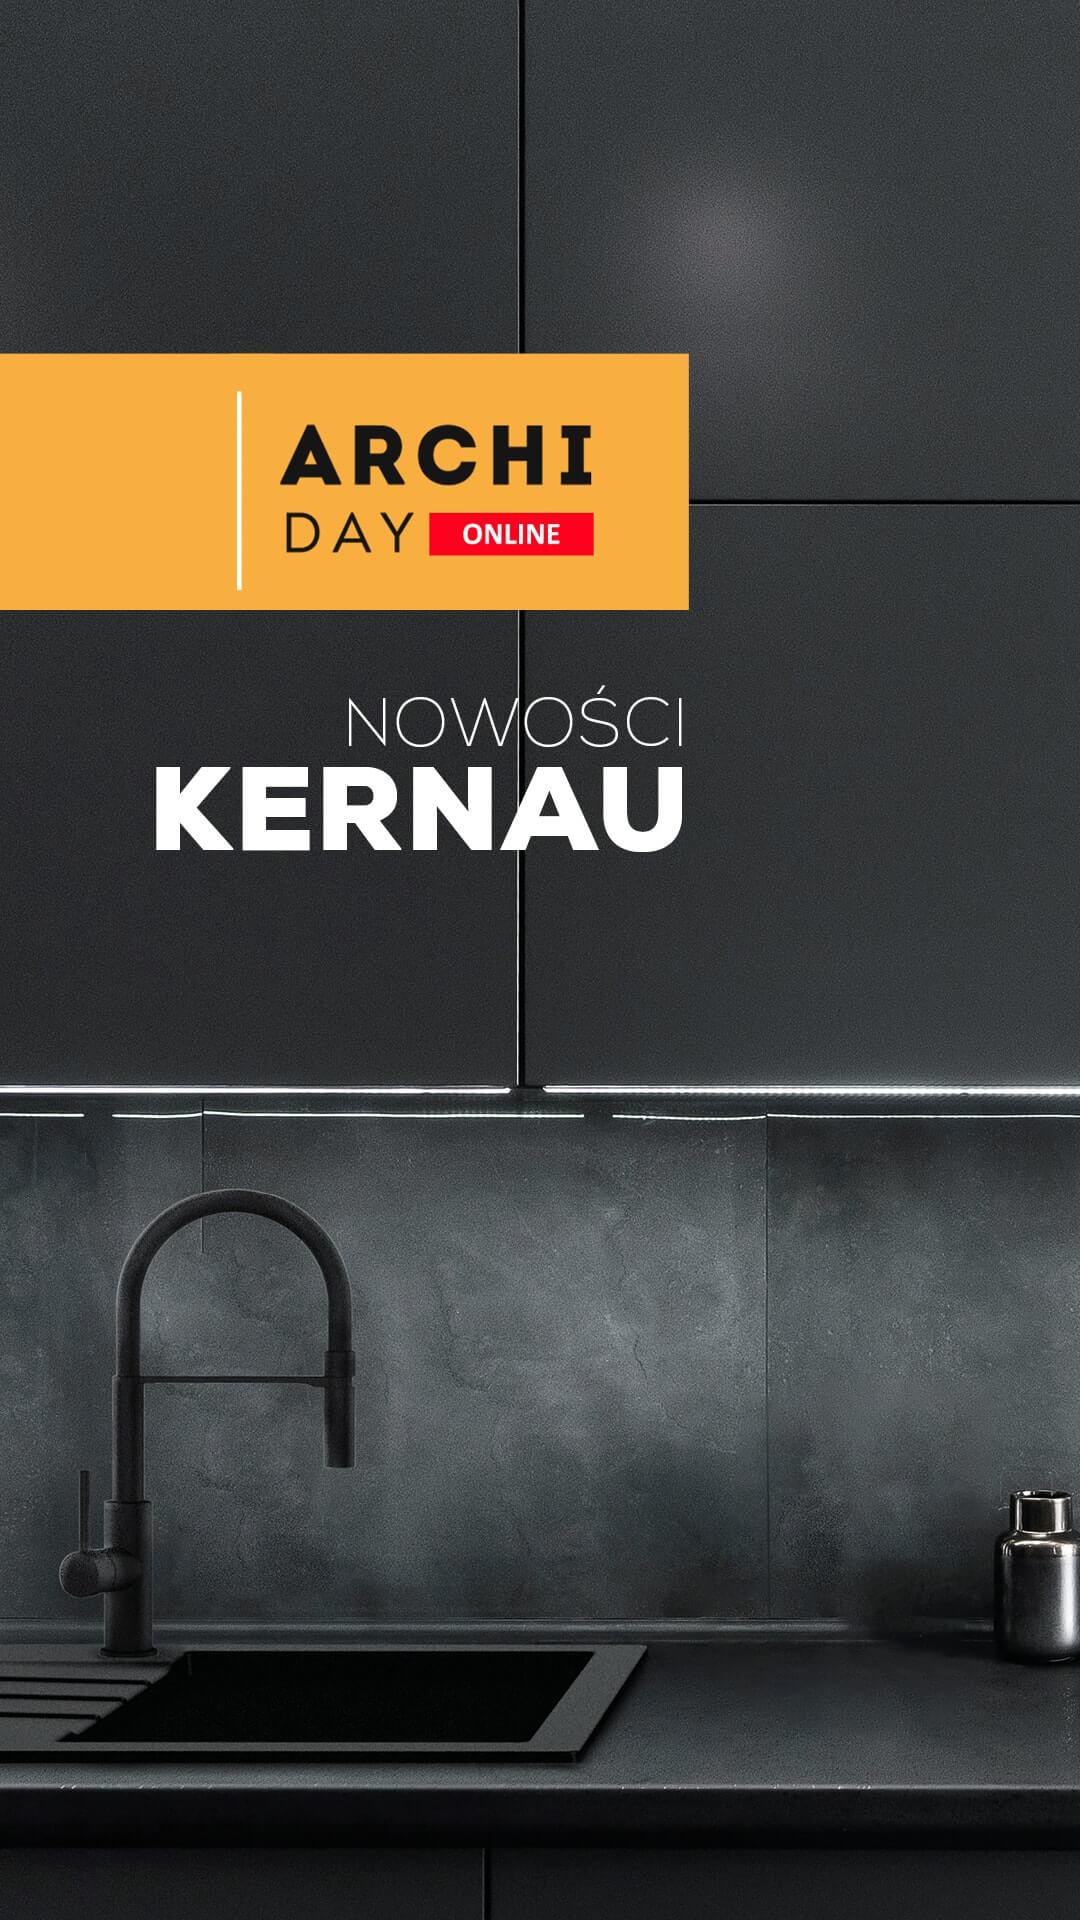 Kernau na archiDAY 2020 online